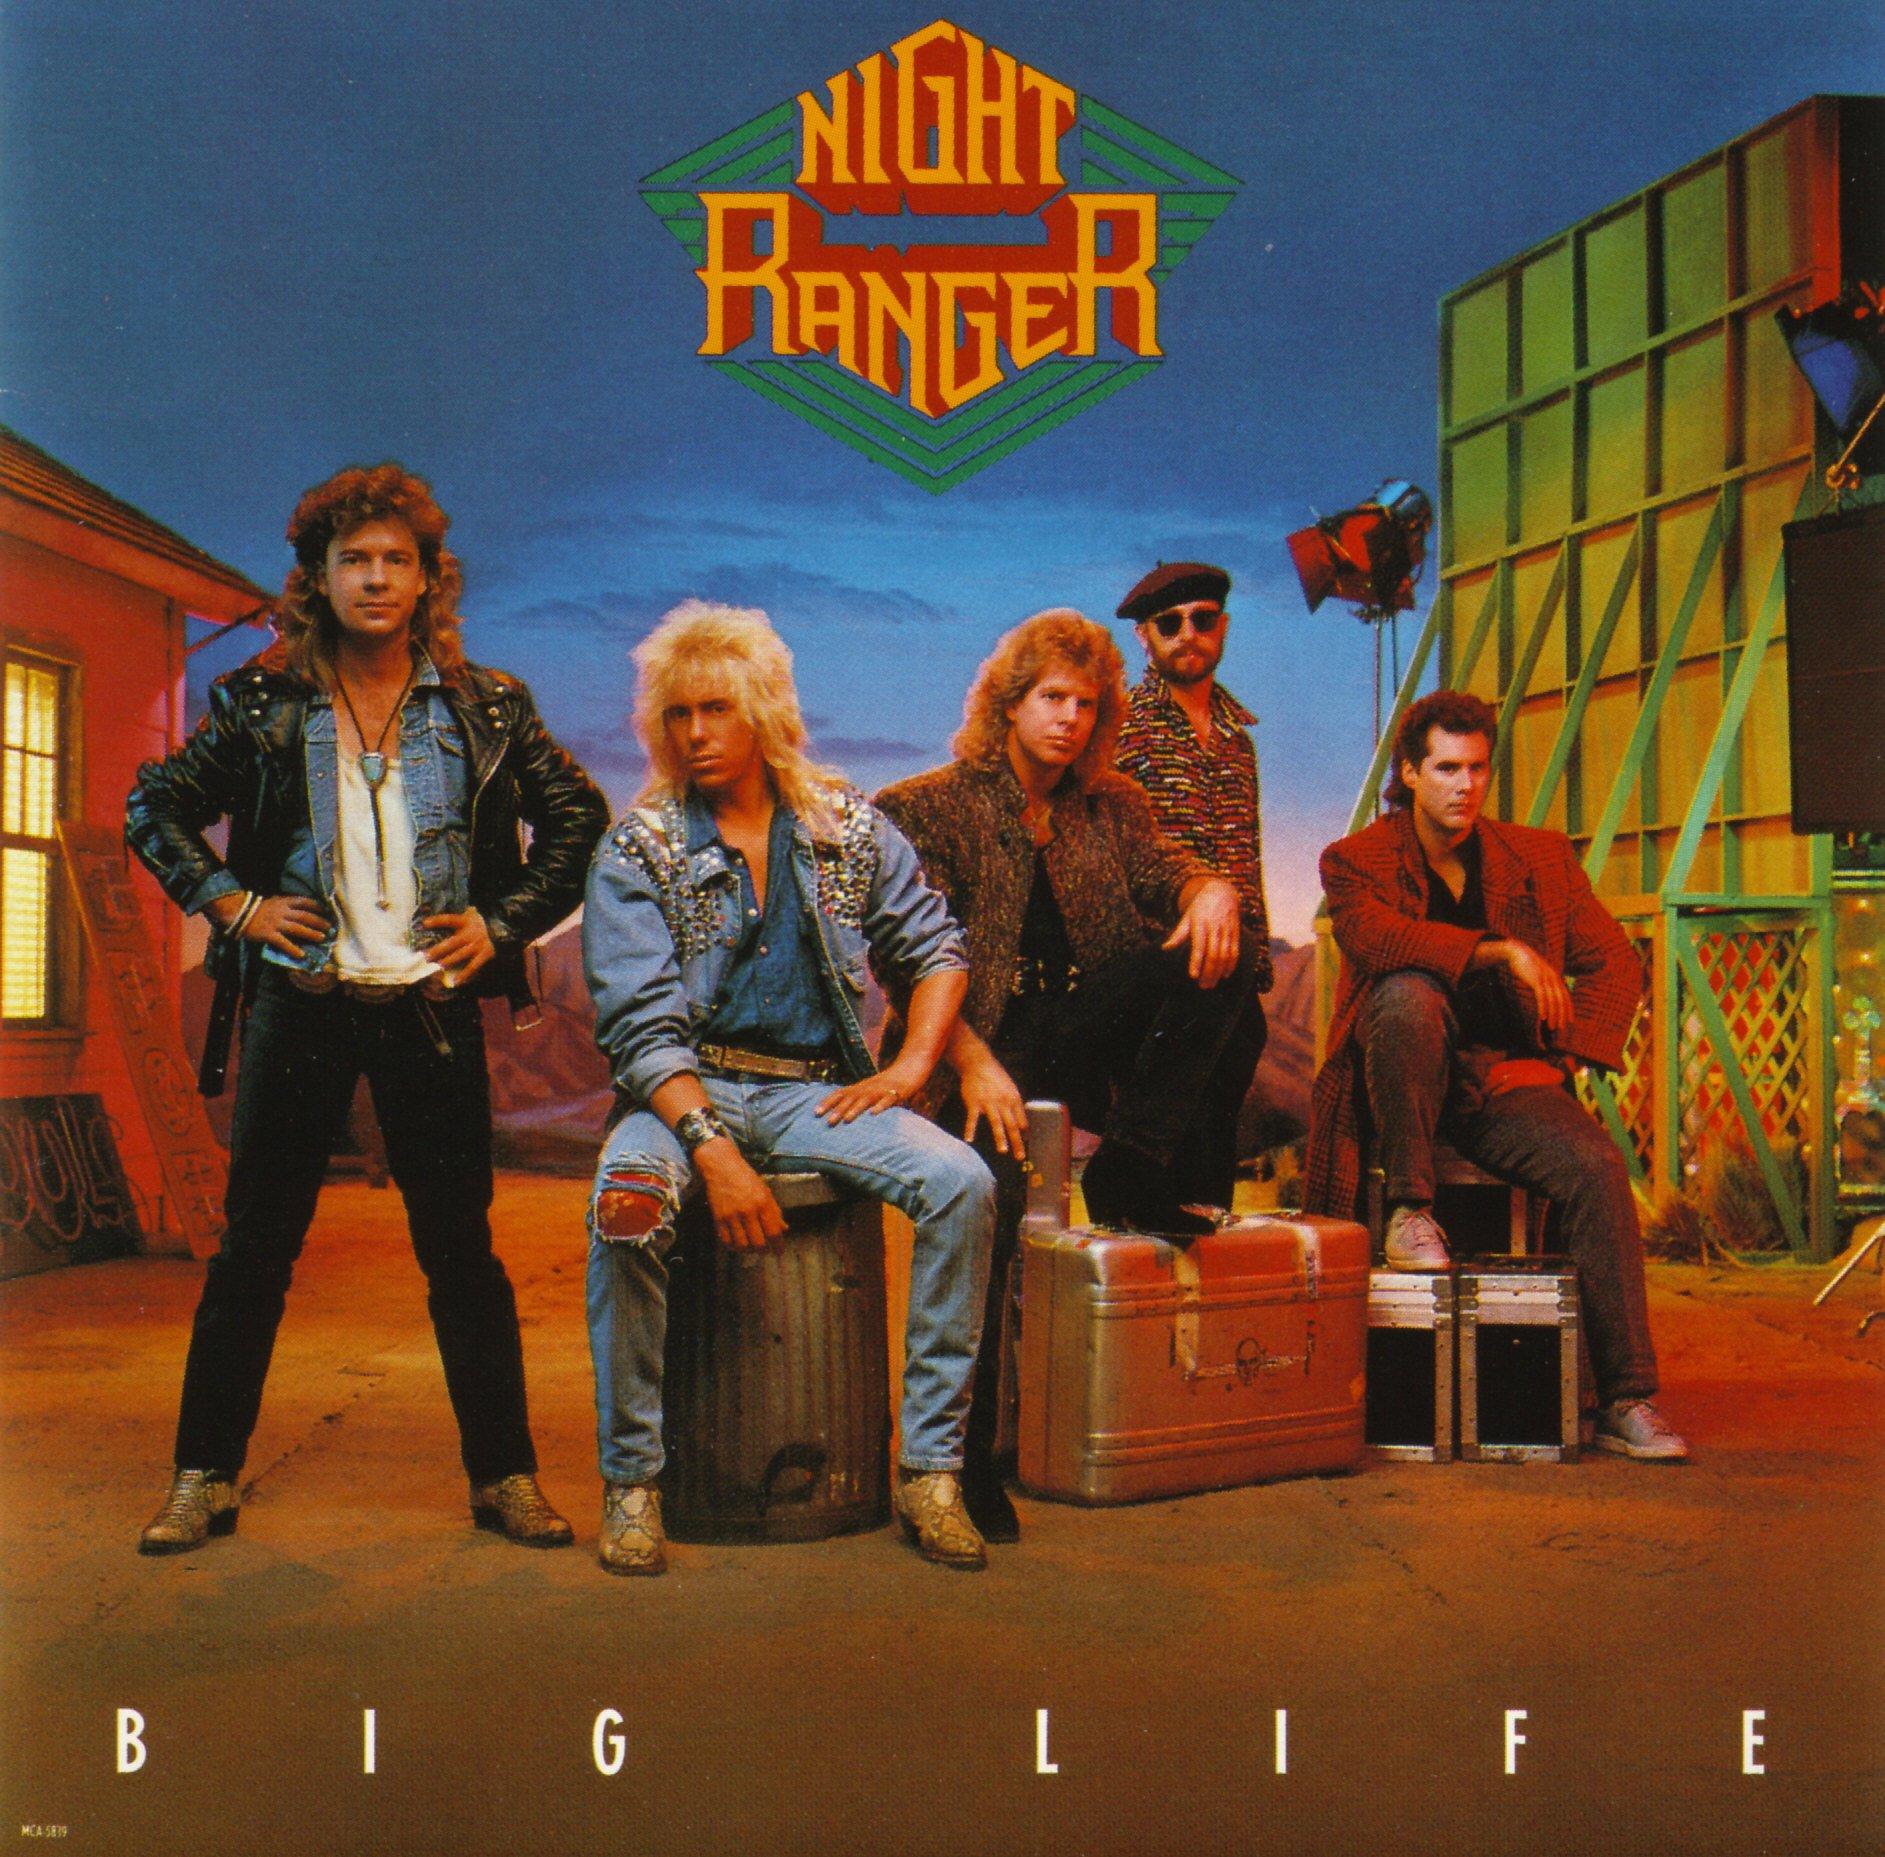 NIGHT RANGER hard rock heavy metal night ranger wallpaper background 1885x1857